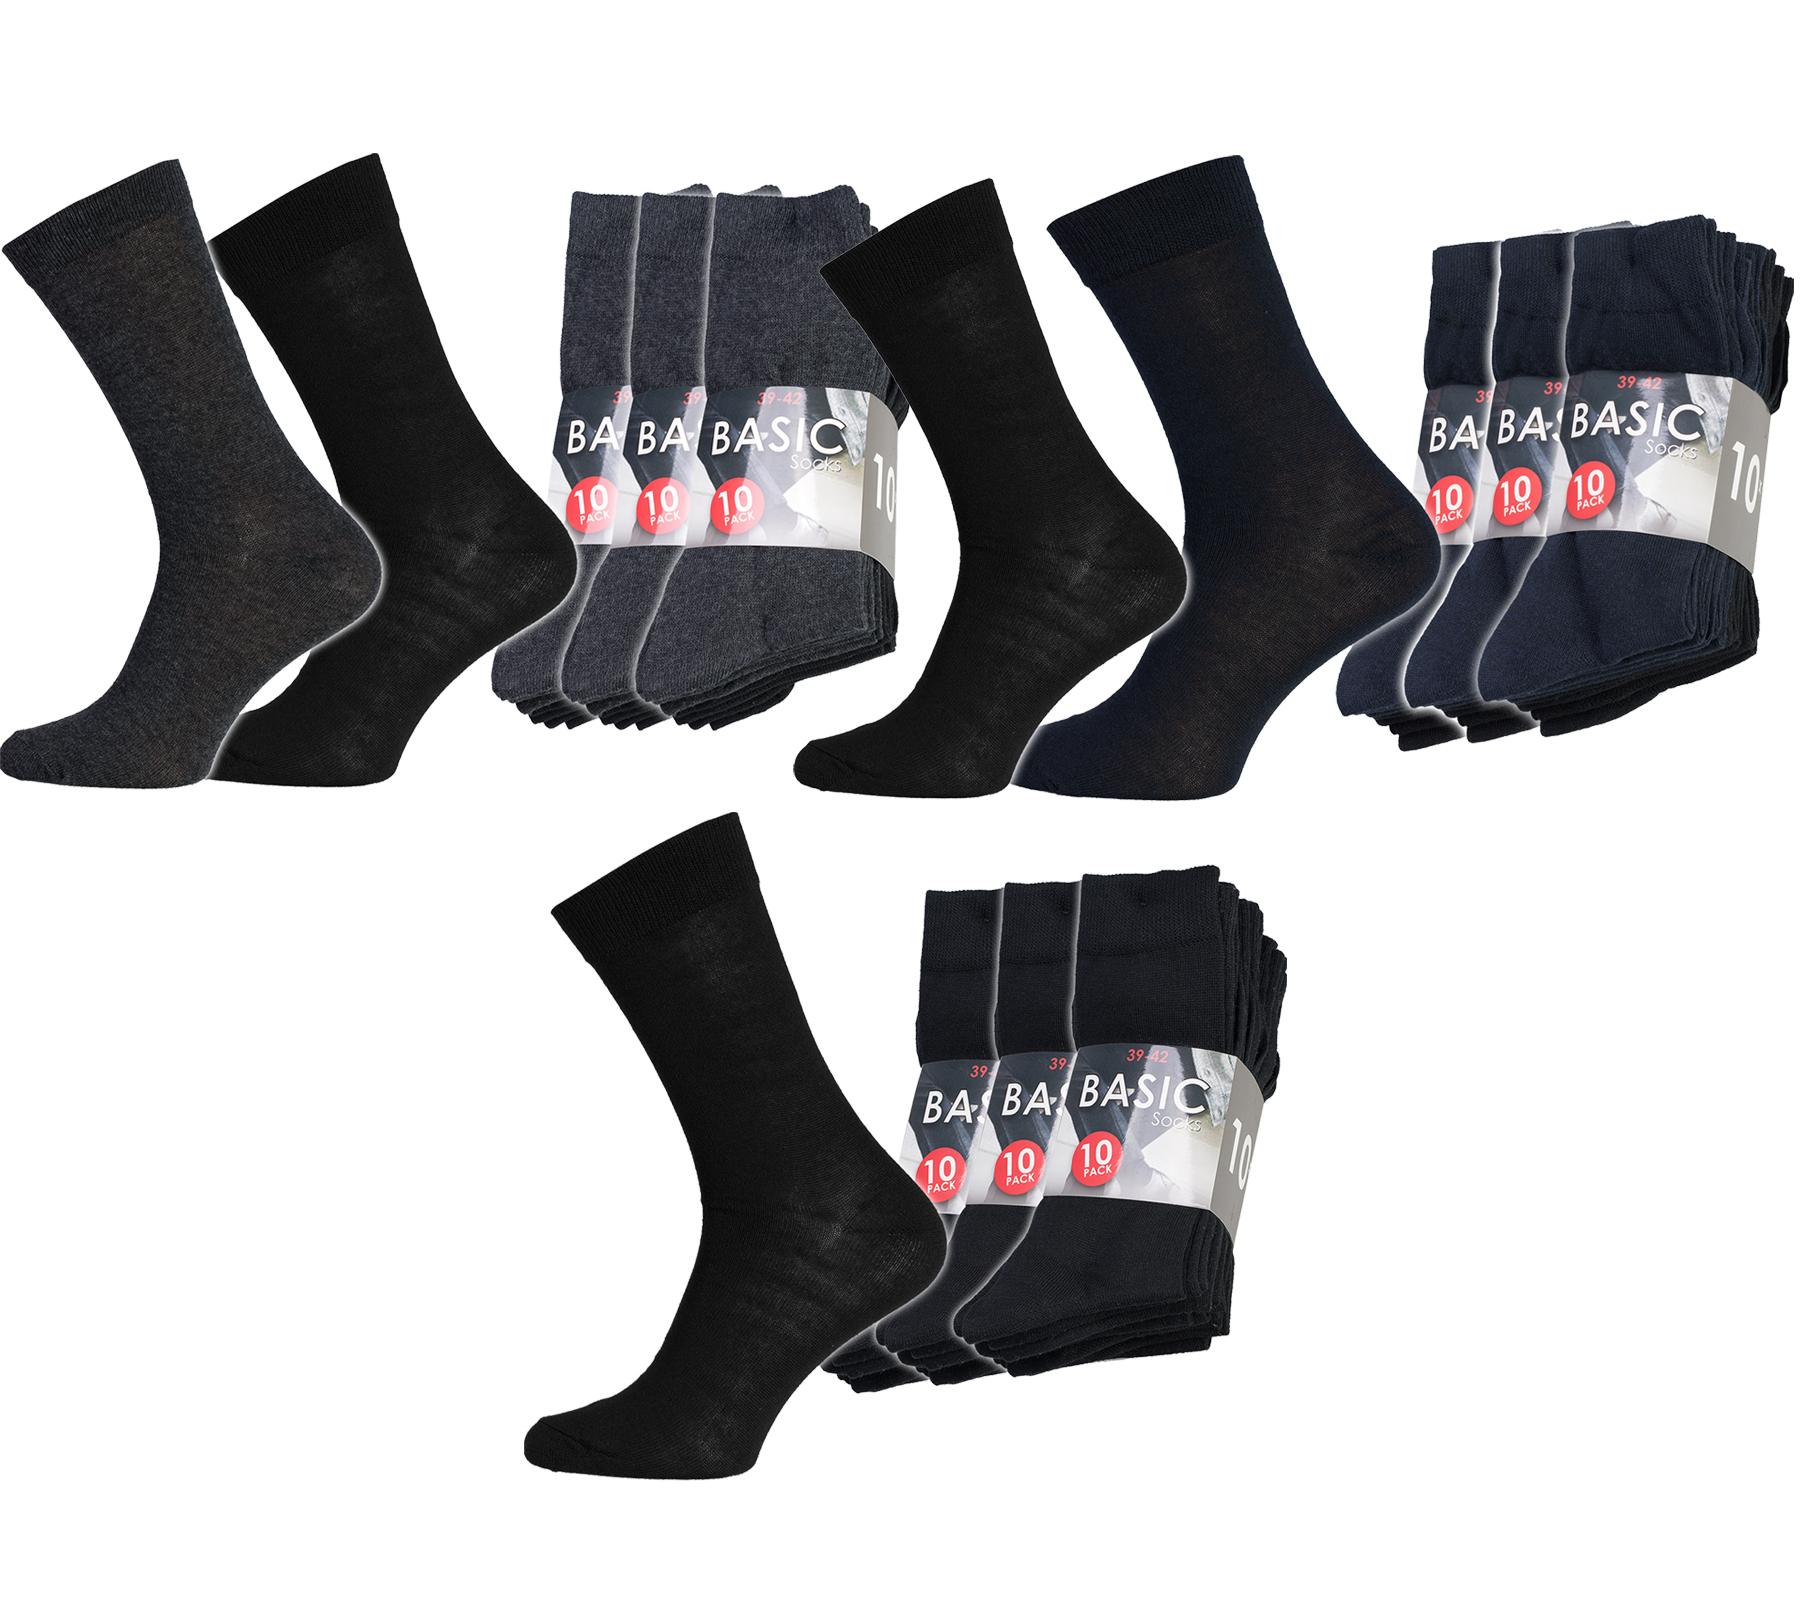 30 er Packung Socken bei Outlett 46 im Angebot